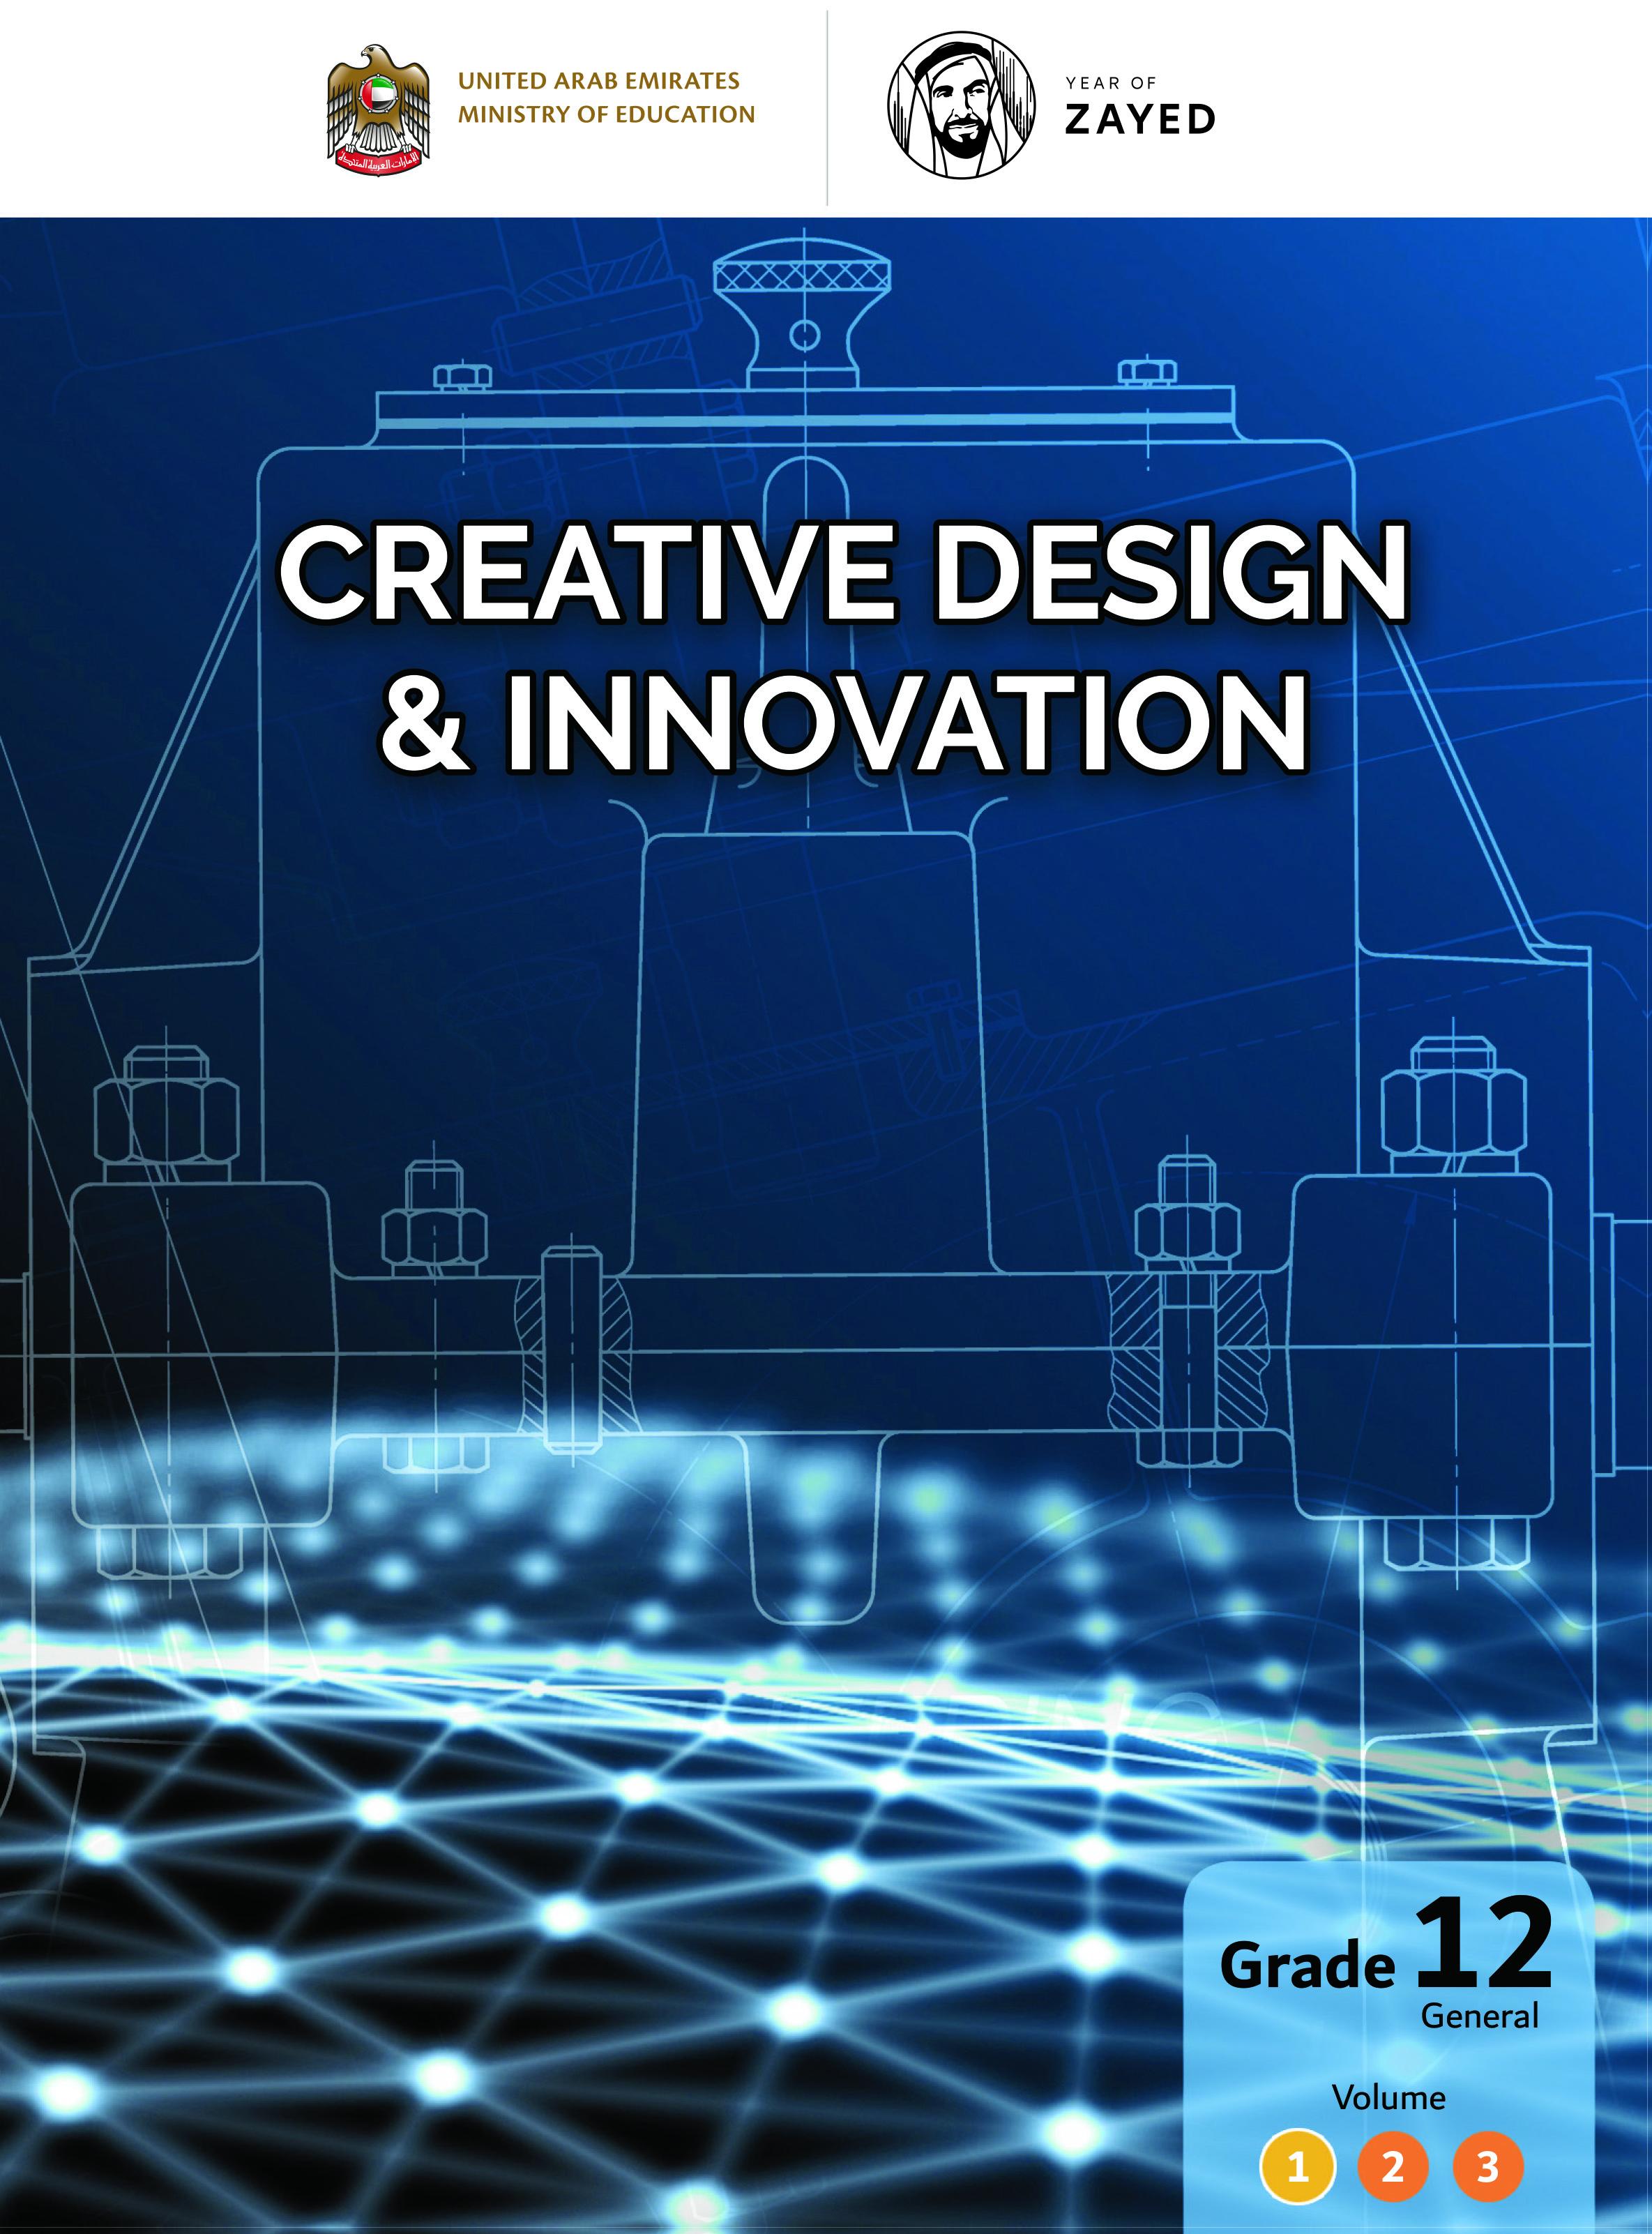 Creative Desing & Innovation - SE - G12_GEN - P01